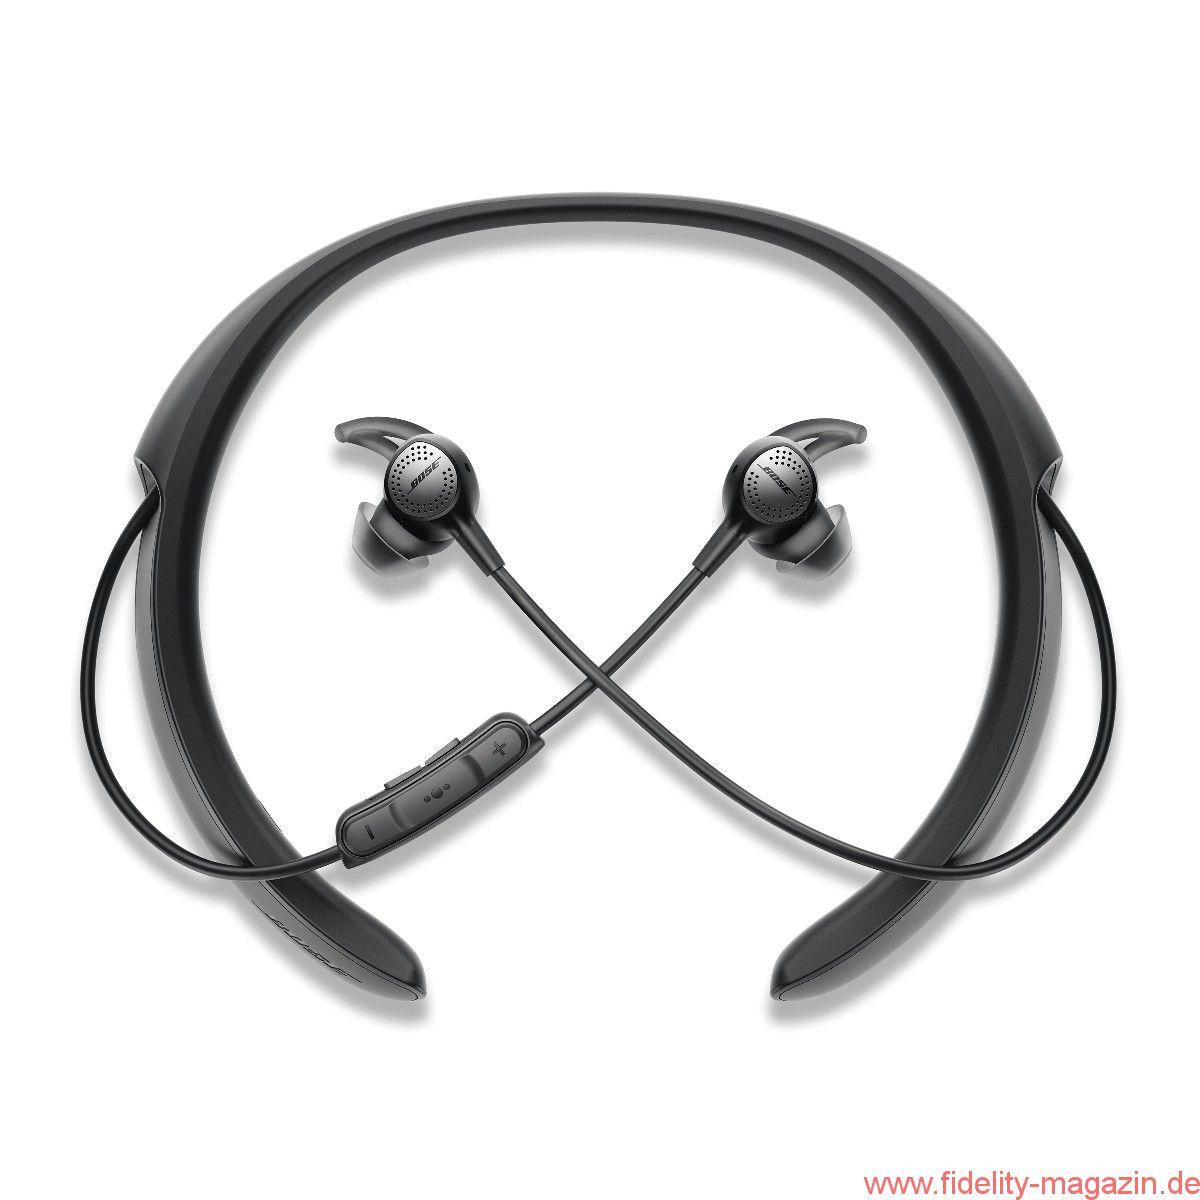 Bose Nachste Generation Kabelloser Kopfhorer Fidelity Online